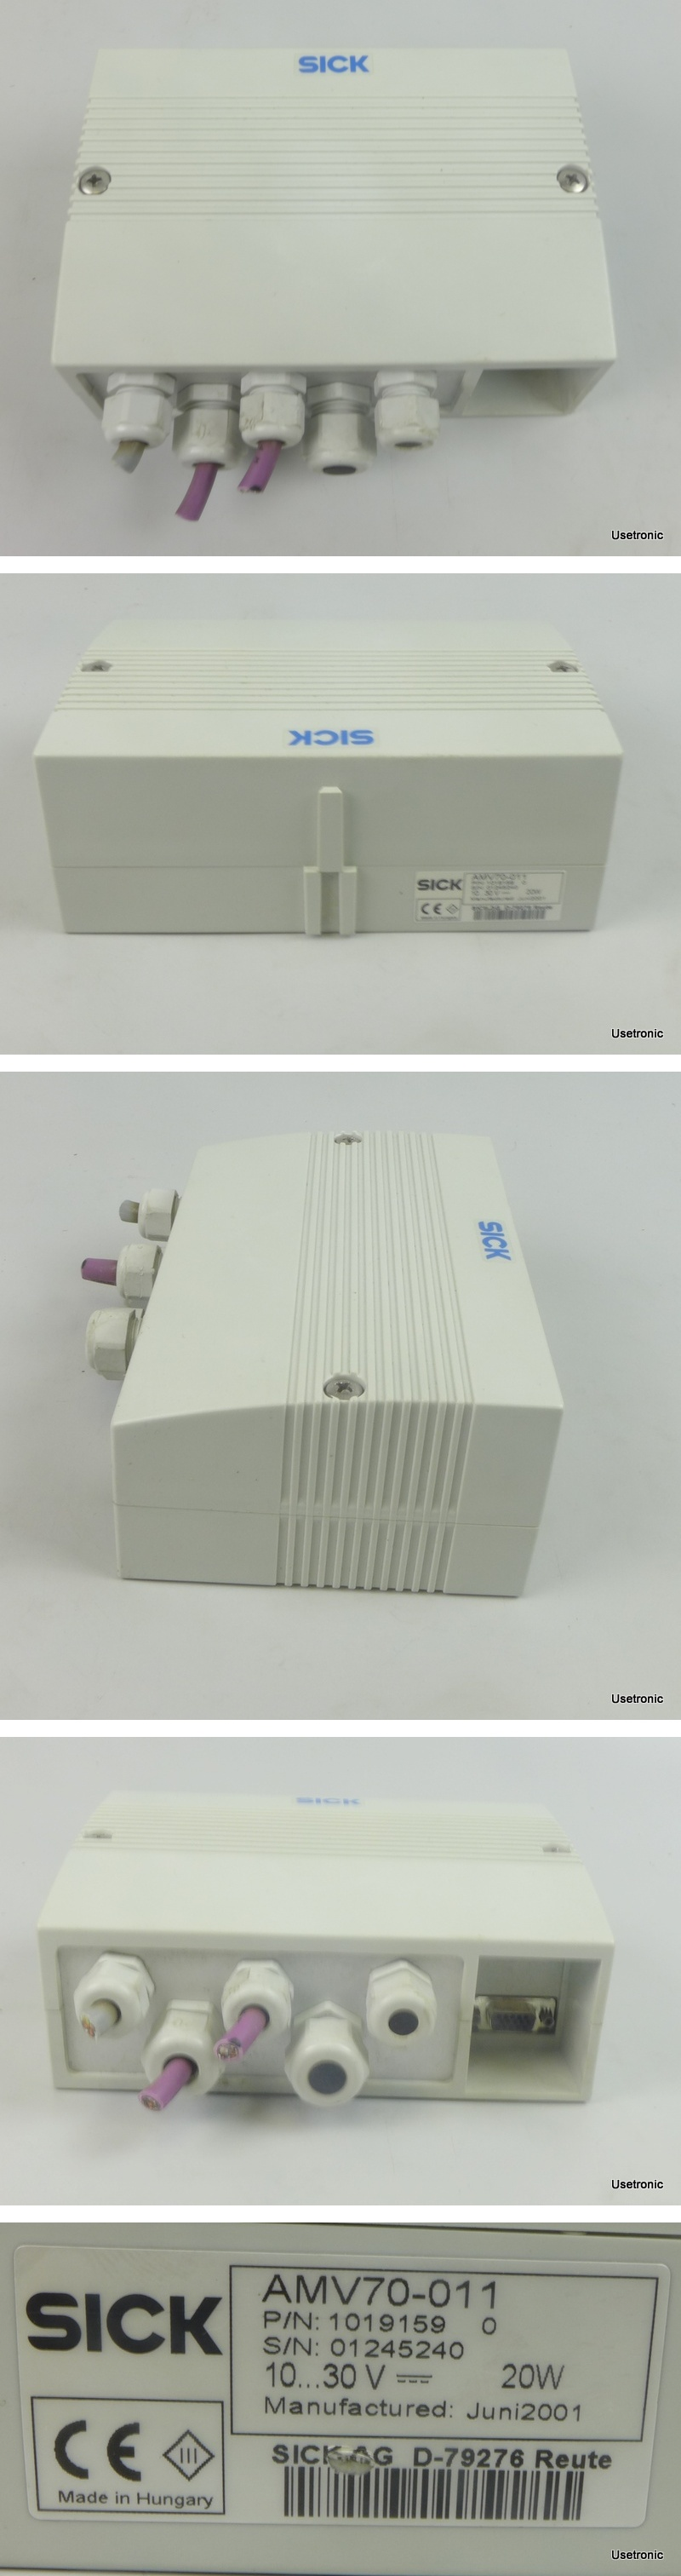 Sick Anschulssmodul AMV 70-011